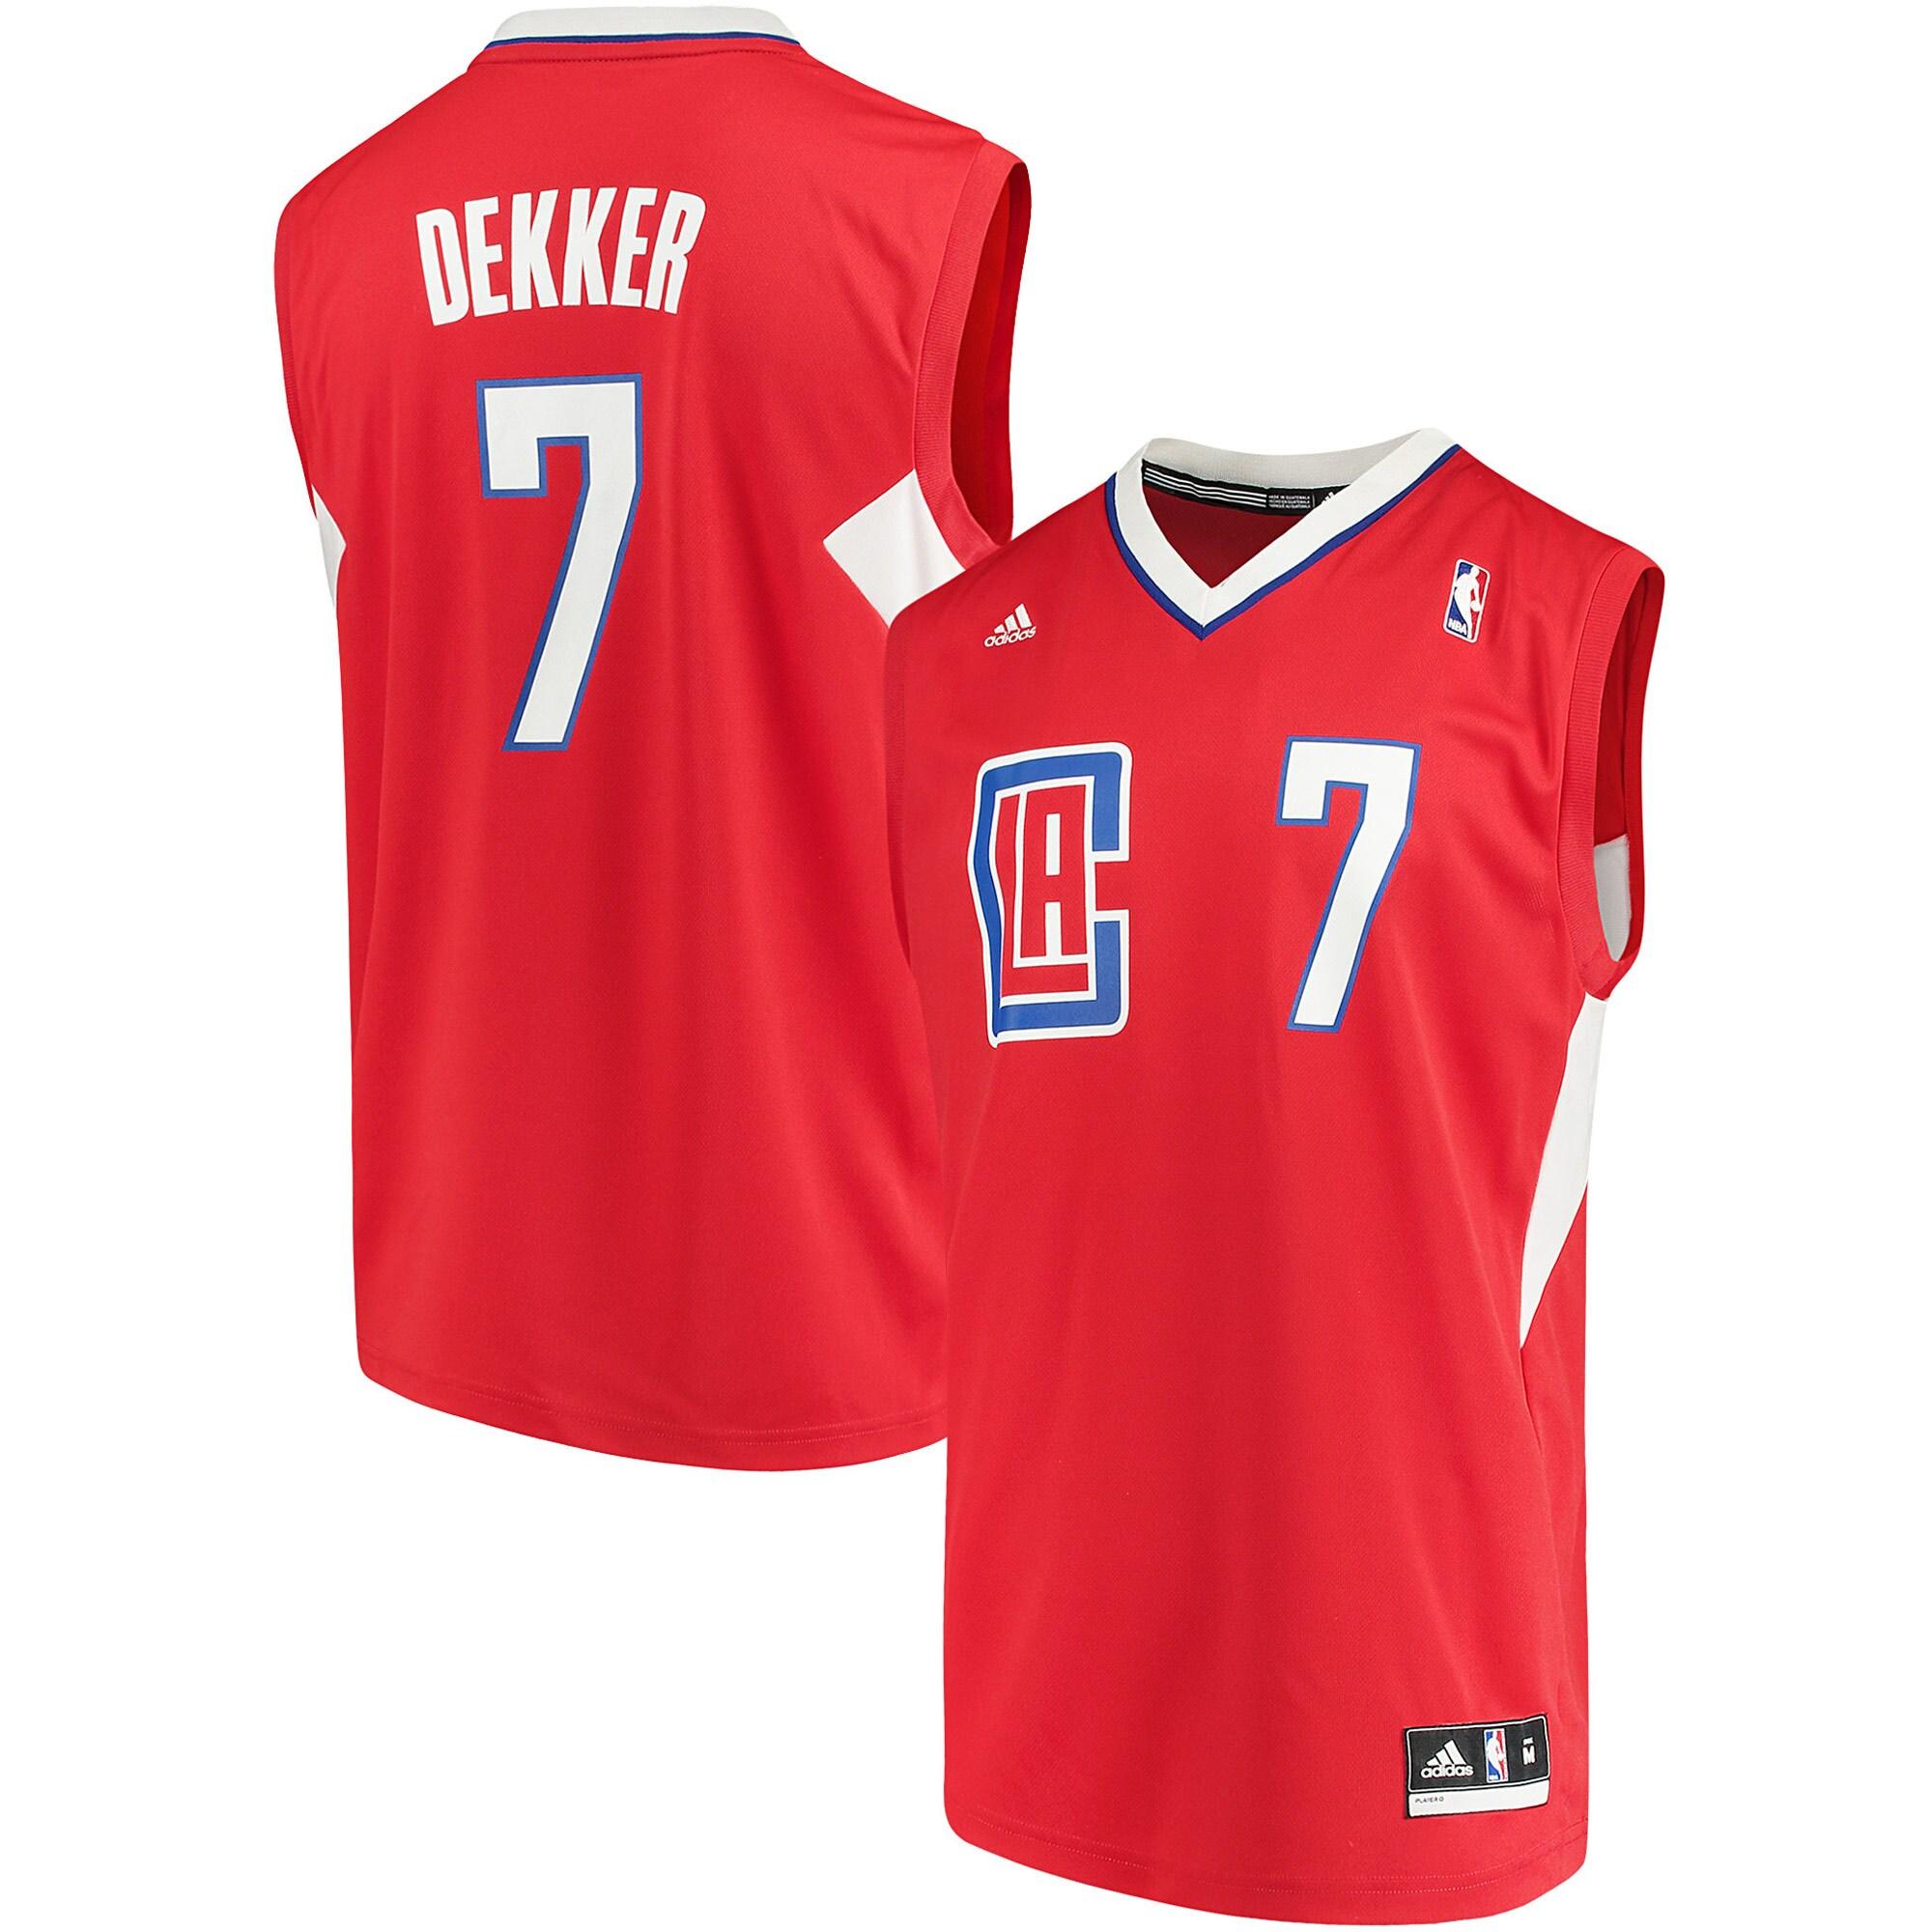 Sam Dekker LA Clippers adidas Road Replica Jersey - Red